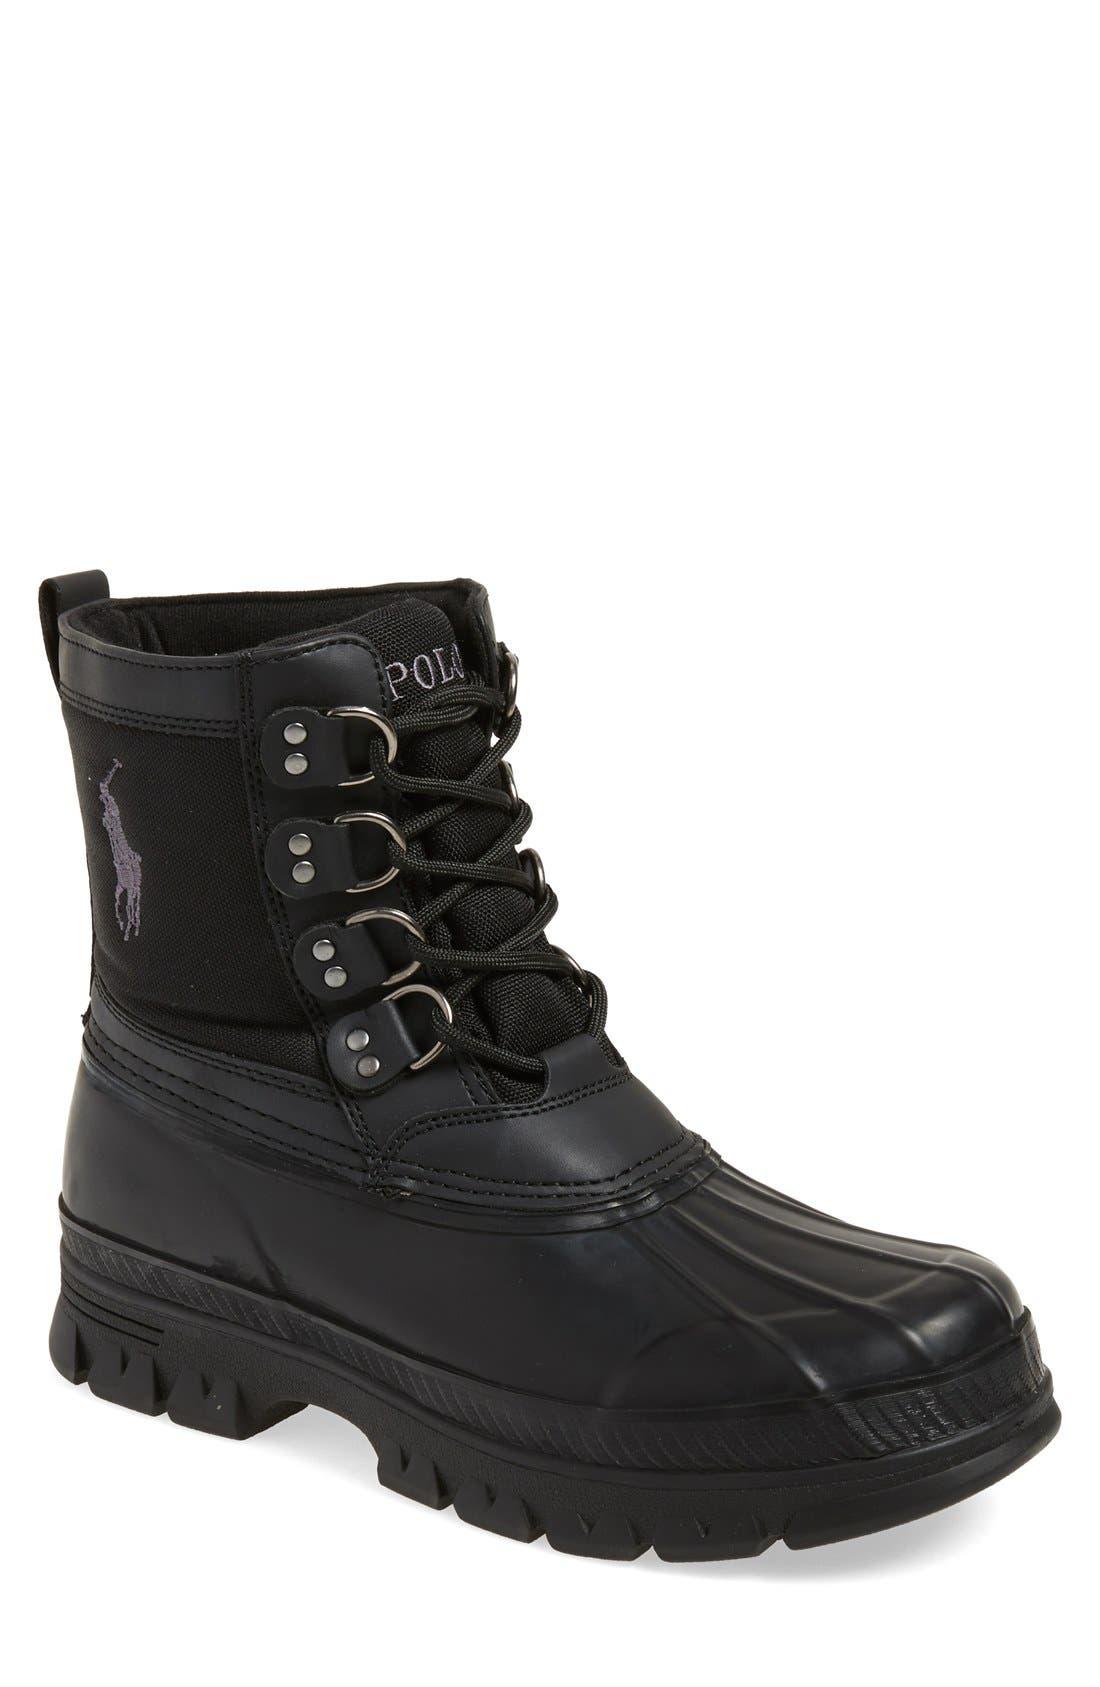 Main Image - Polo Ralph Lauren 'Crestwick' Tall Boot